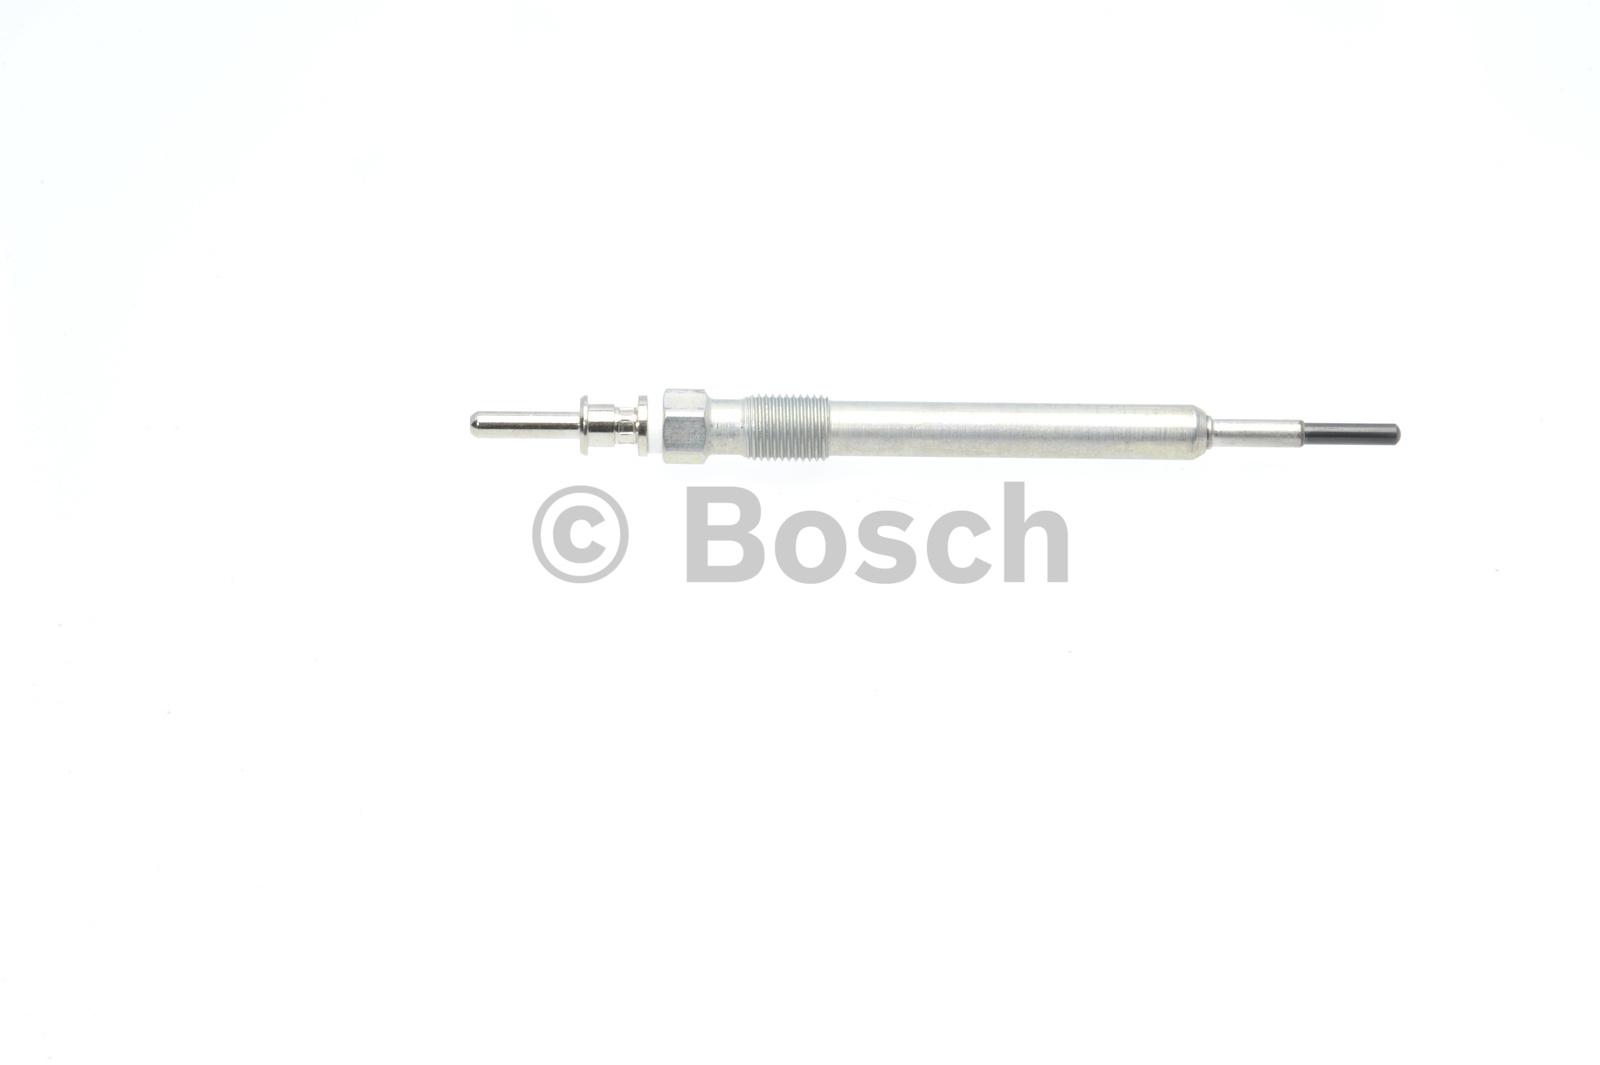 BOSCH - Свеча накаливания BMW E87, F20, E90, F10, E84 Diesel